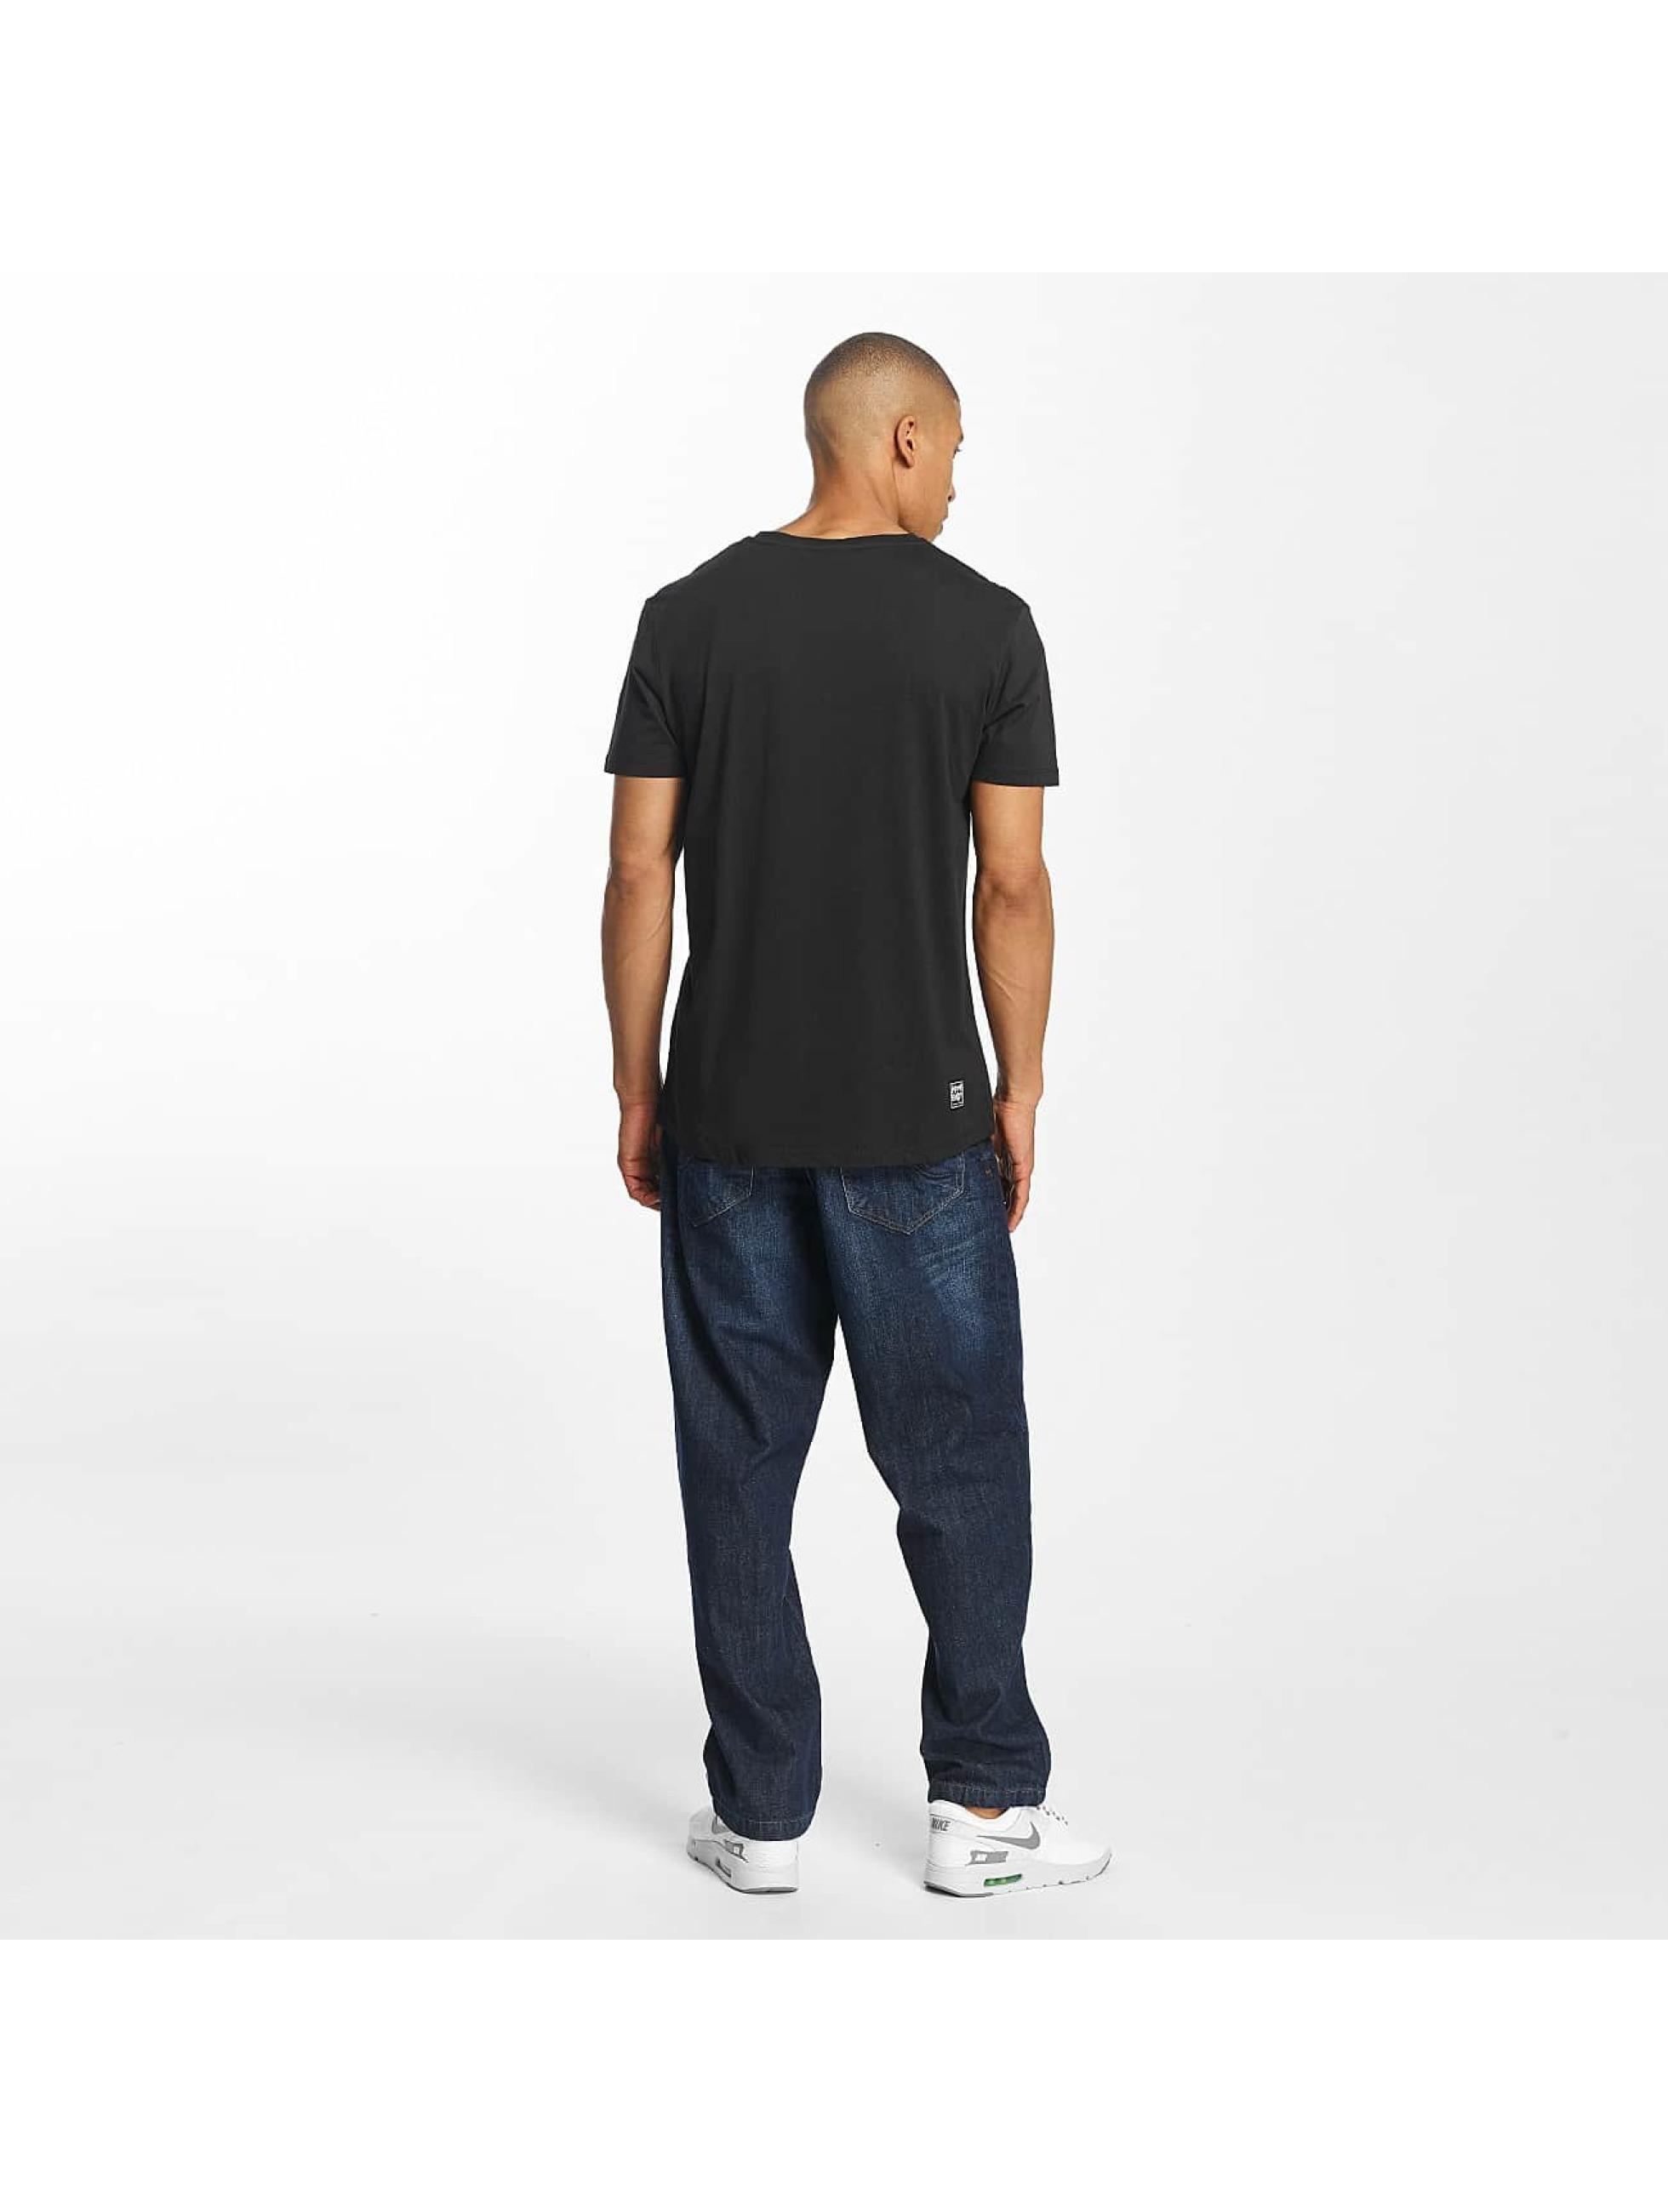 Homeboy T-Shirt Take You Home black